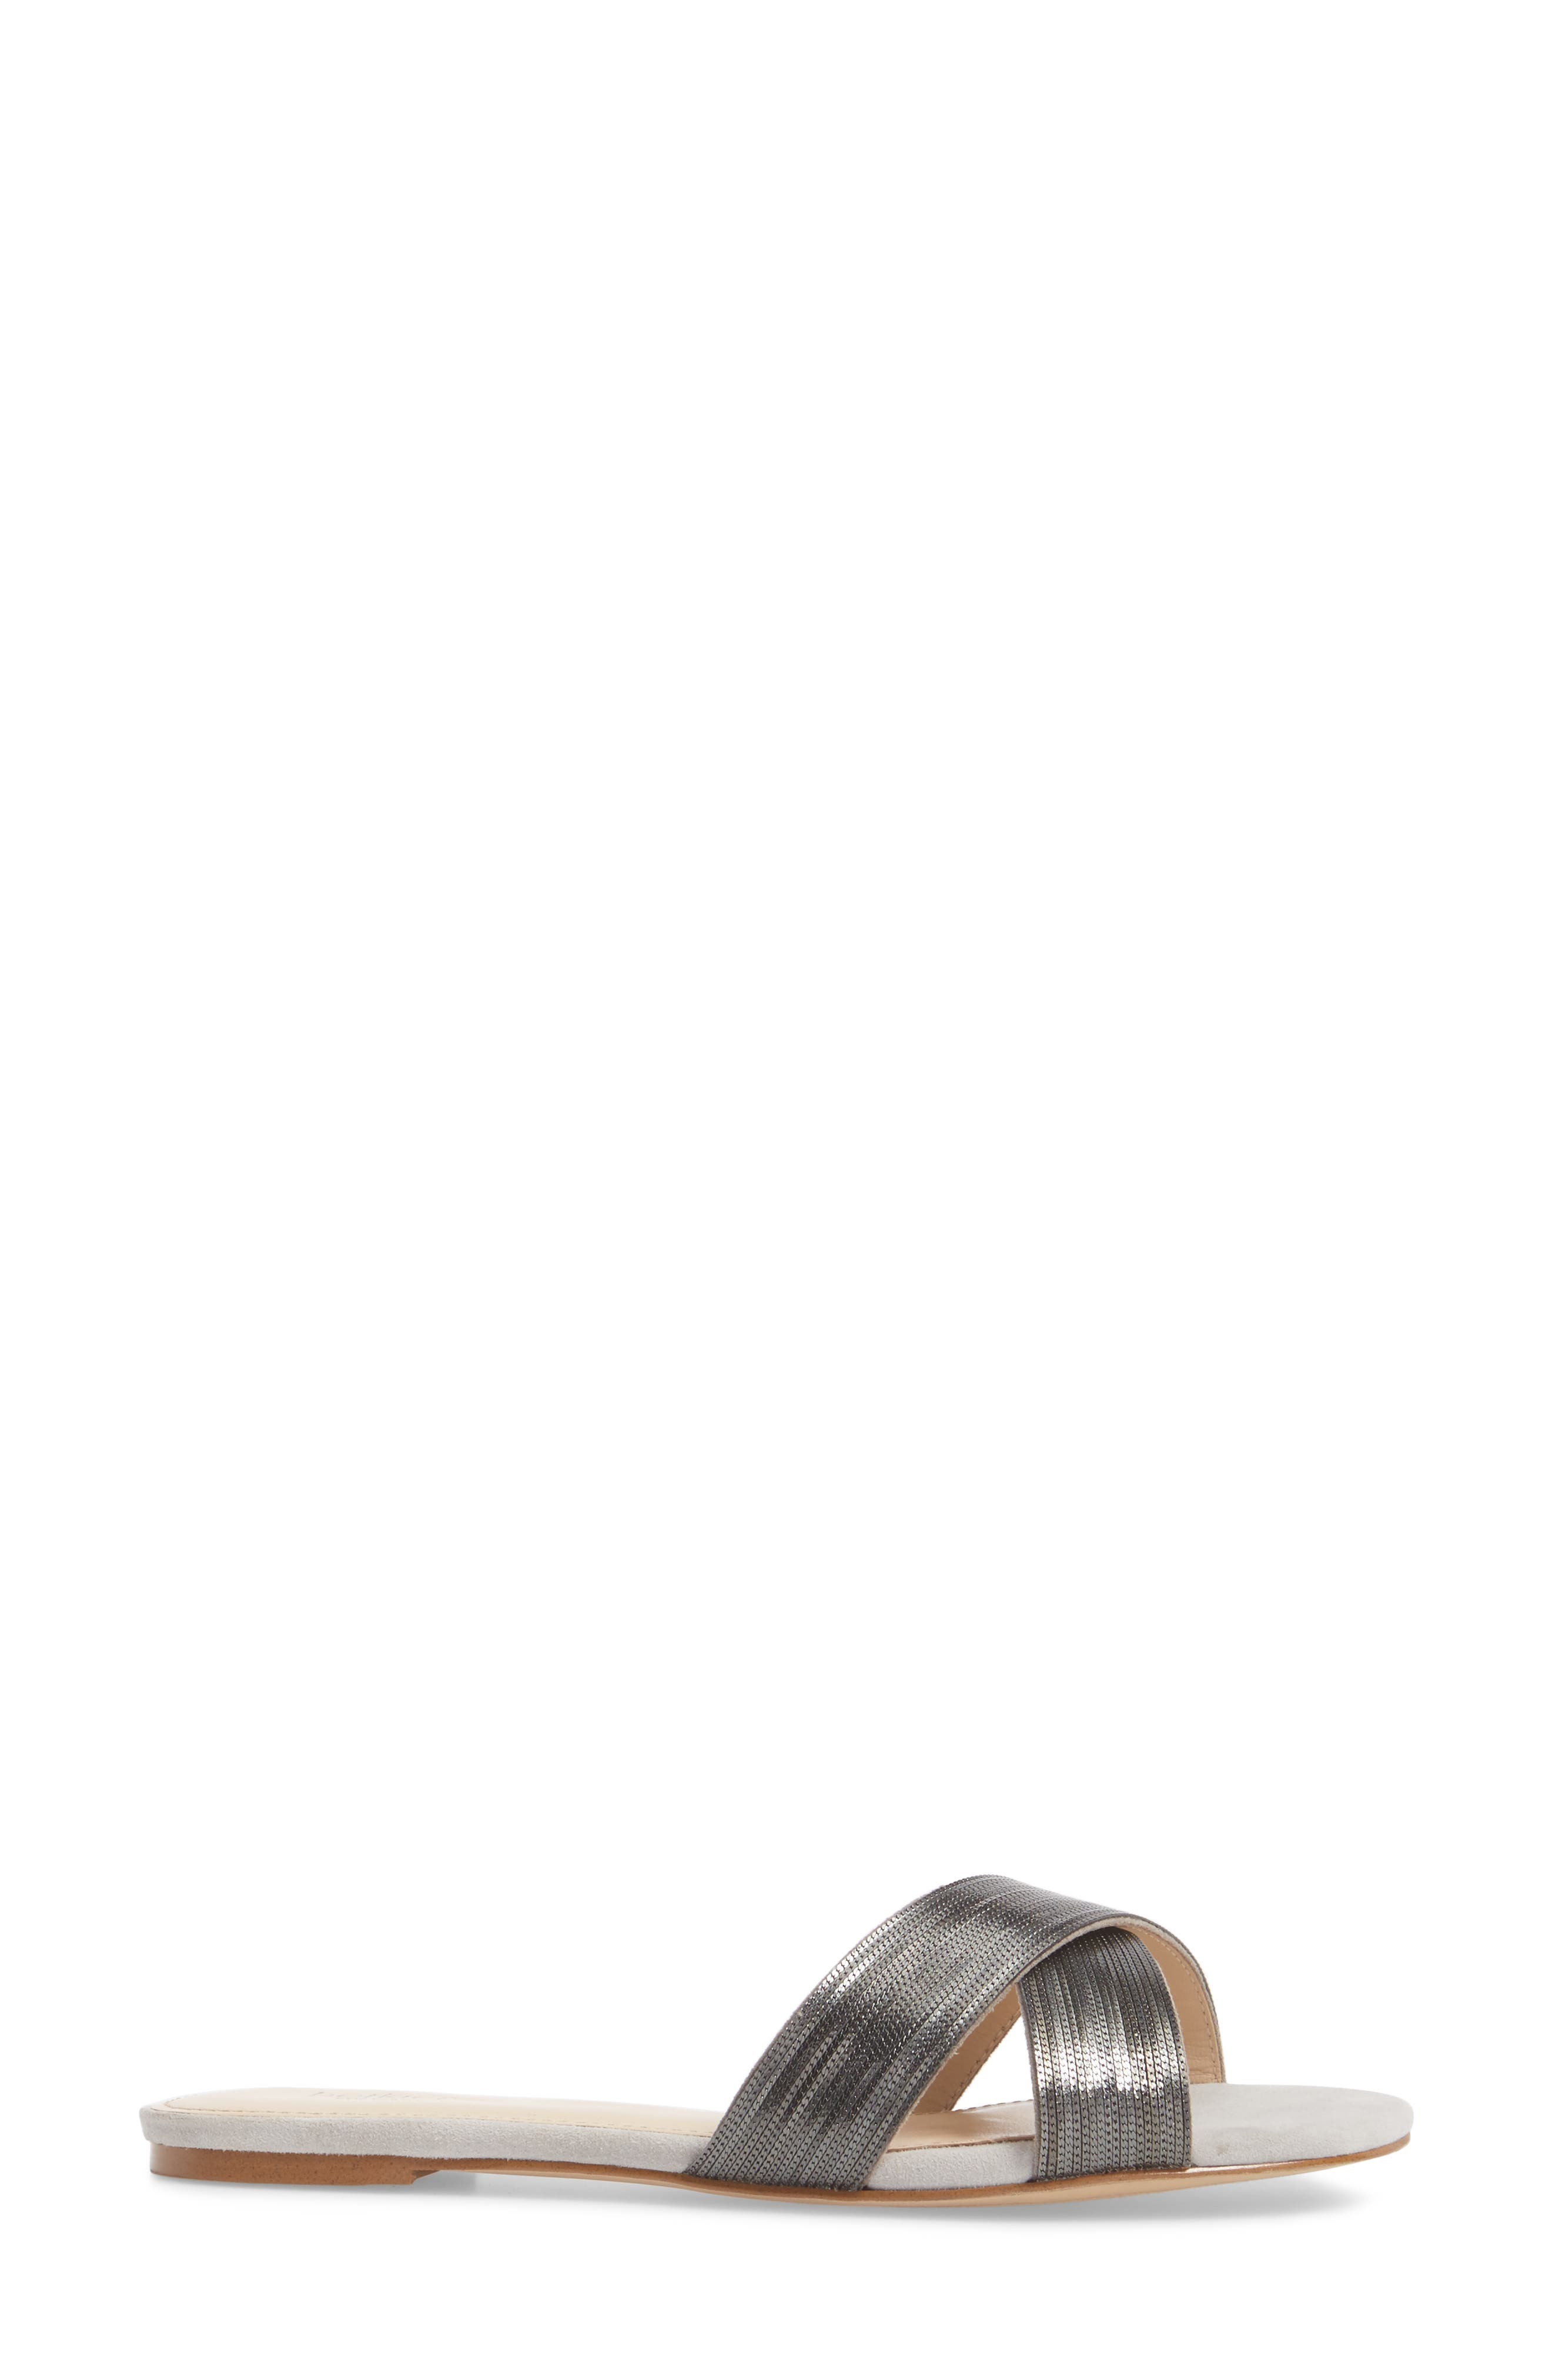 Millie Cross Strap Slide Sandal,                             Alternate thumbnail 3, color,                             CLAY/ GUNMETAL SUEDE